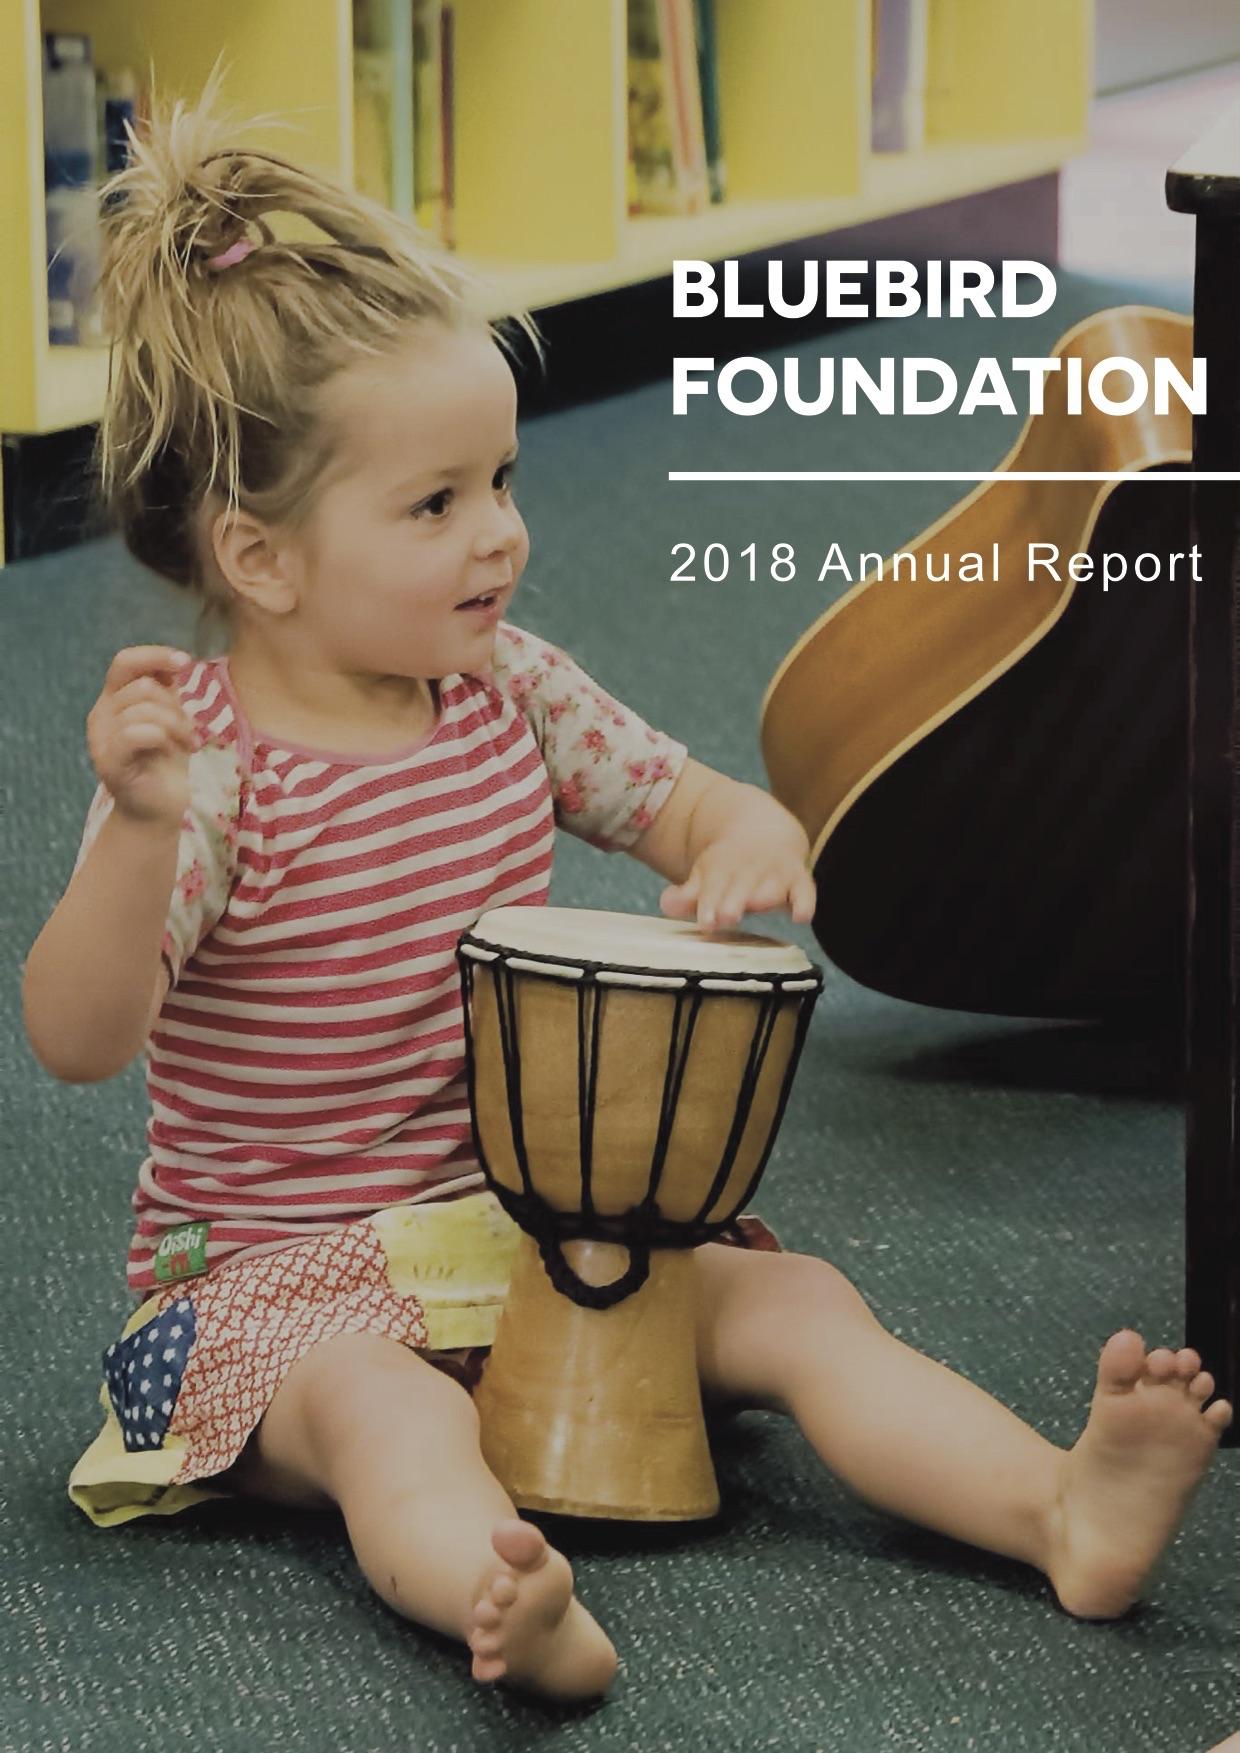 Bluebird Foundation 2018 Annual Report